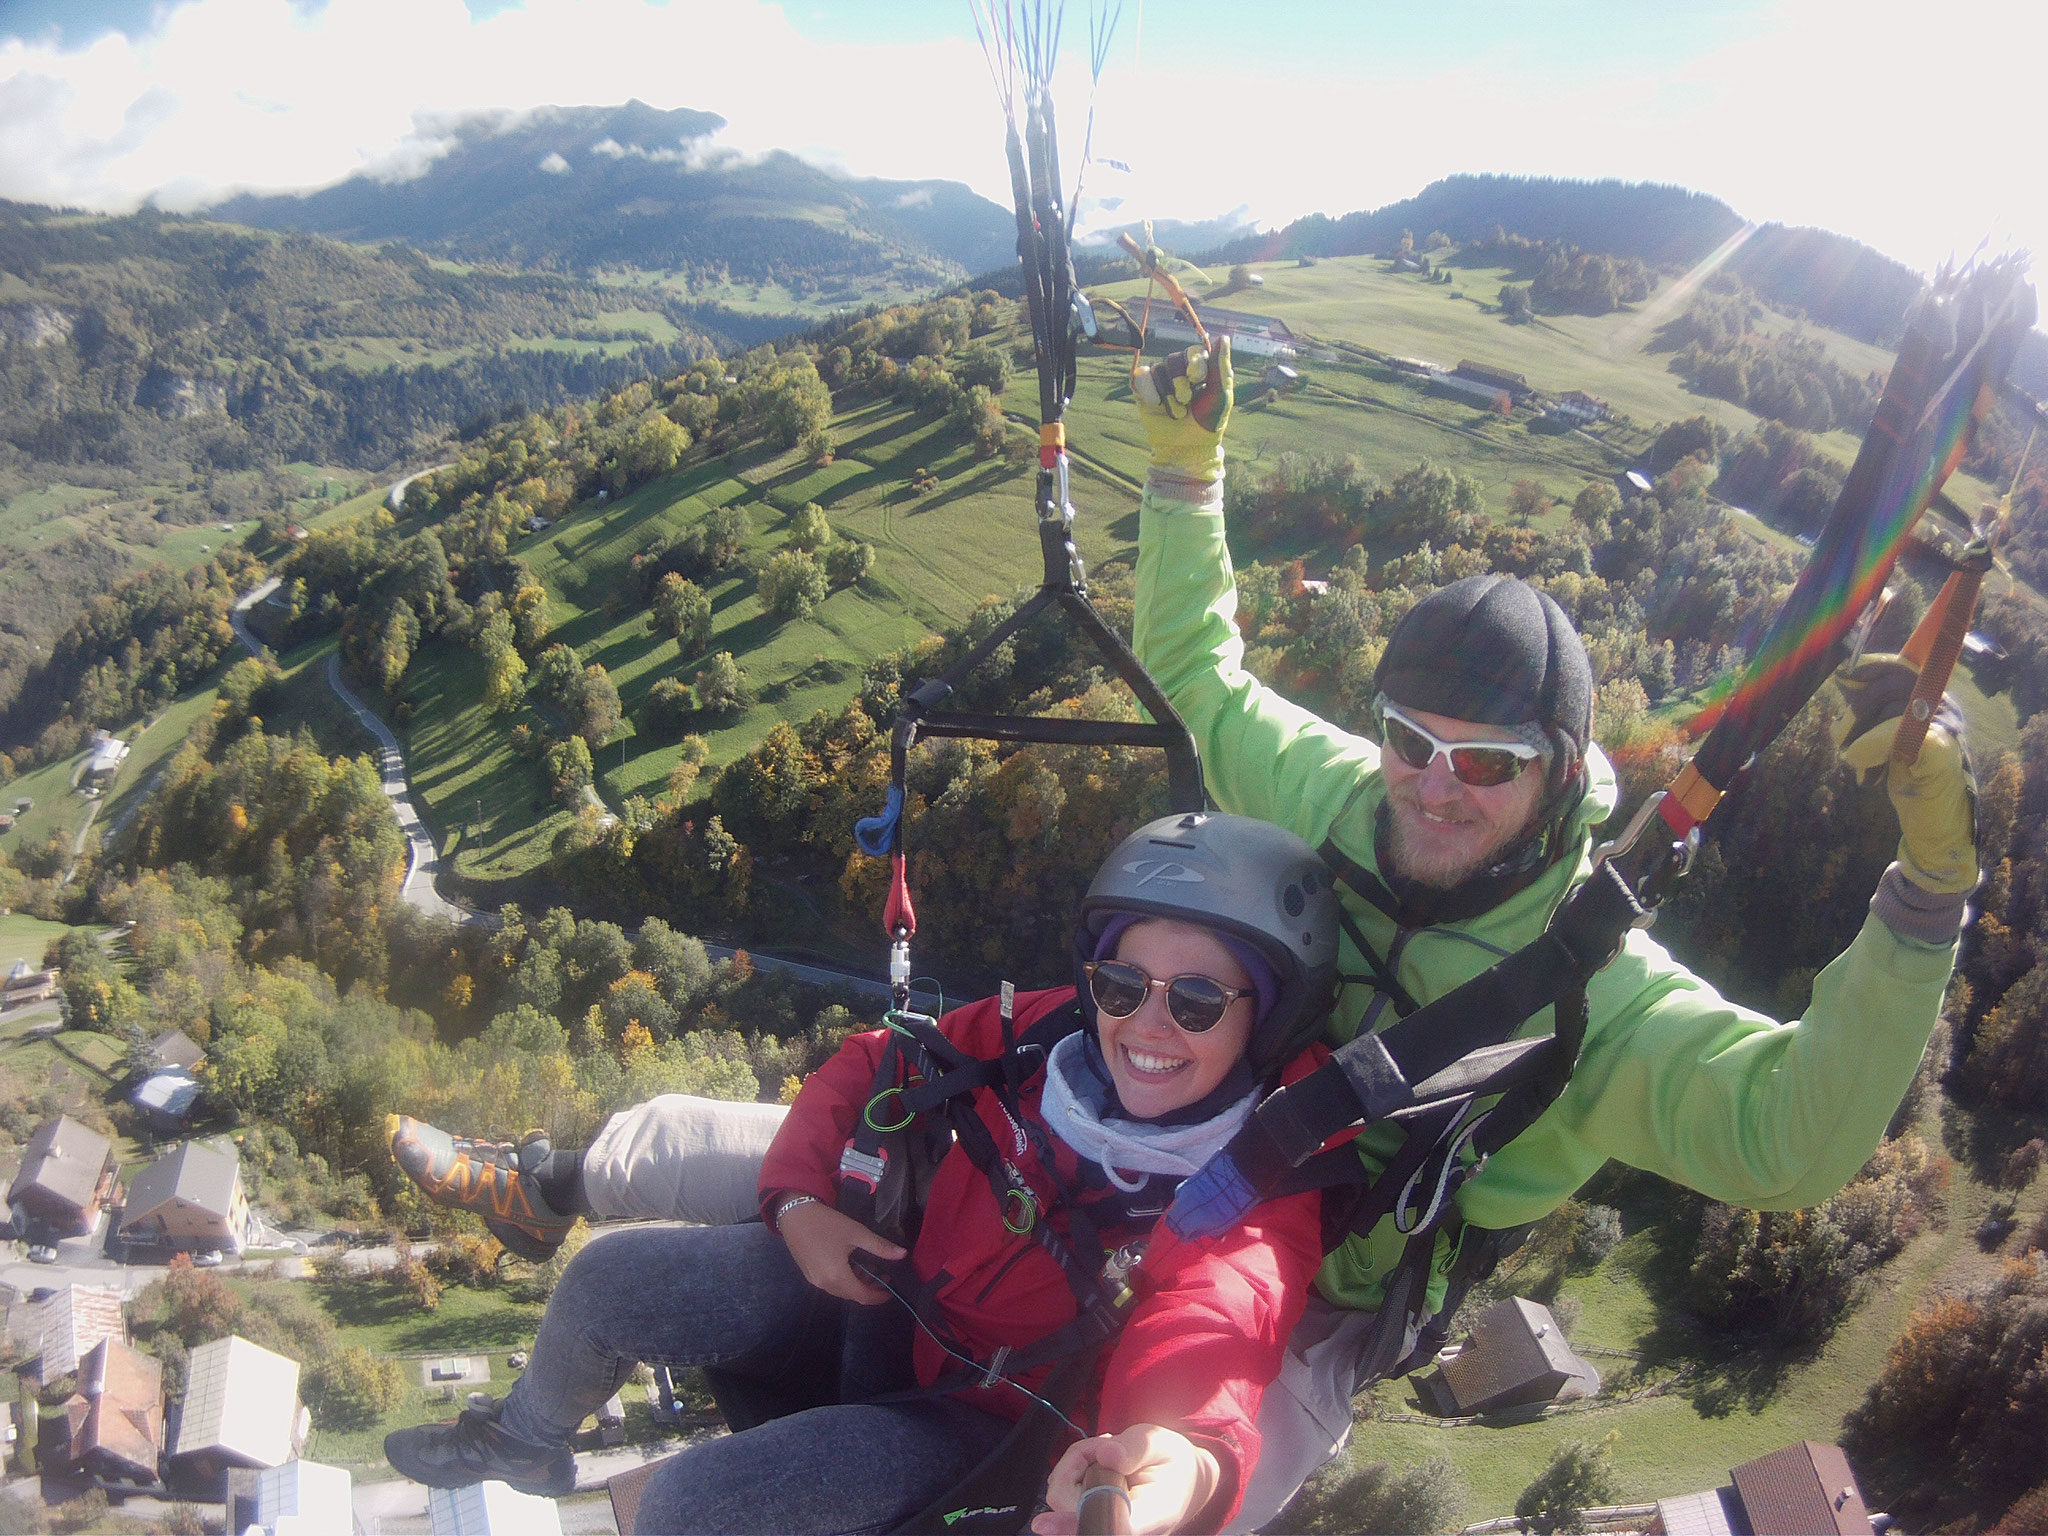 Flug mit Simona vom Bündnerrigi über Luven